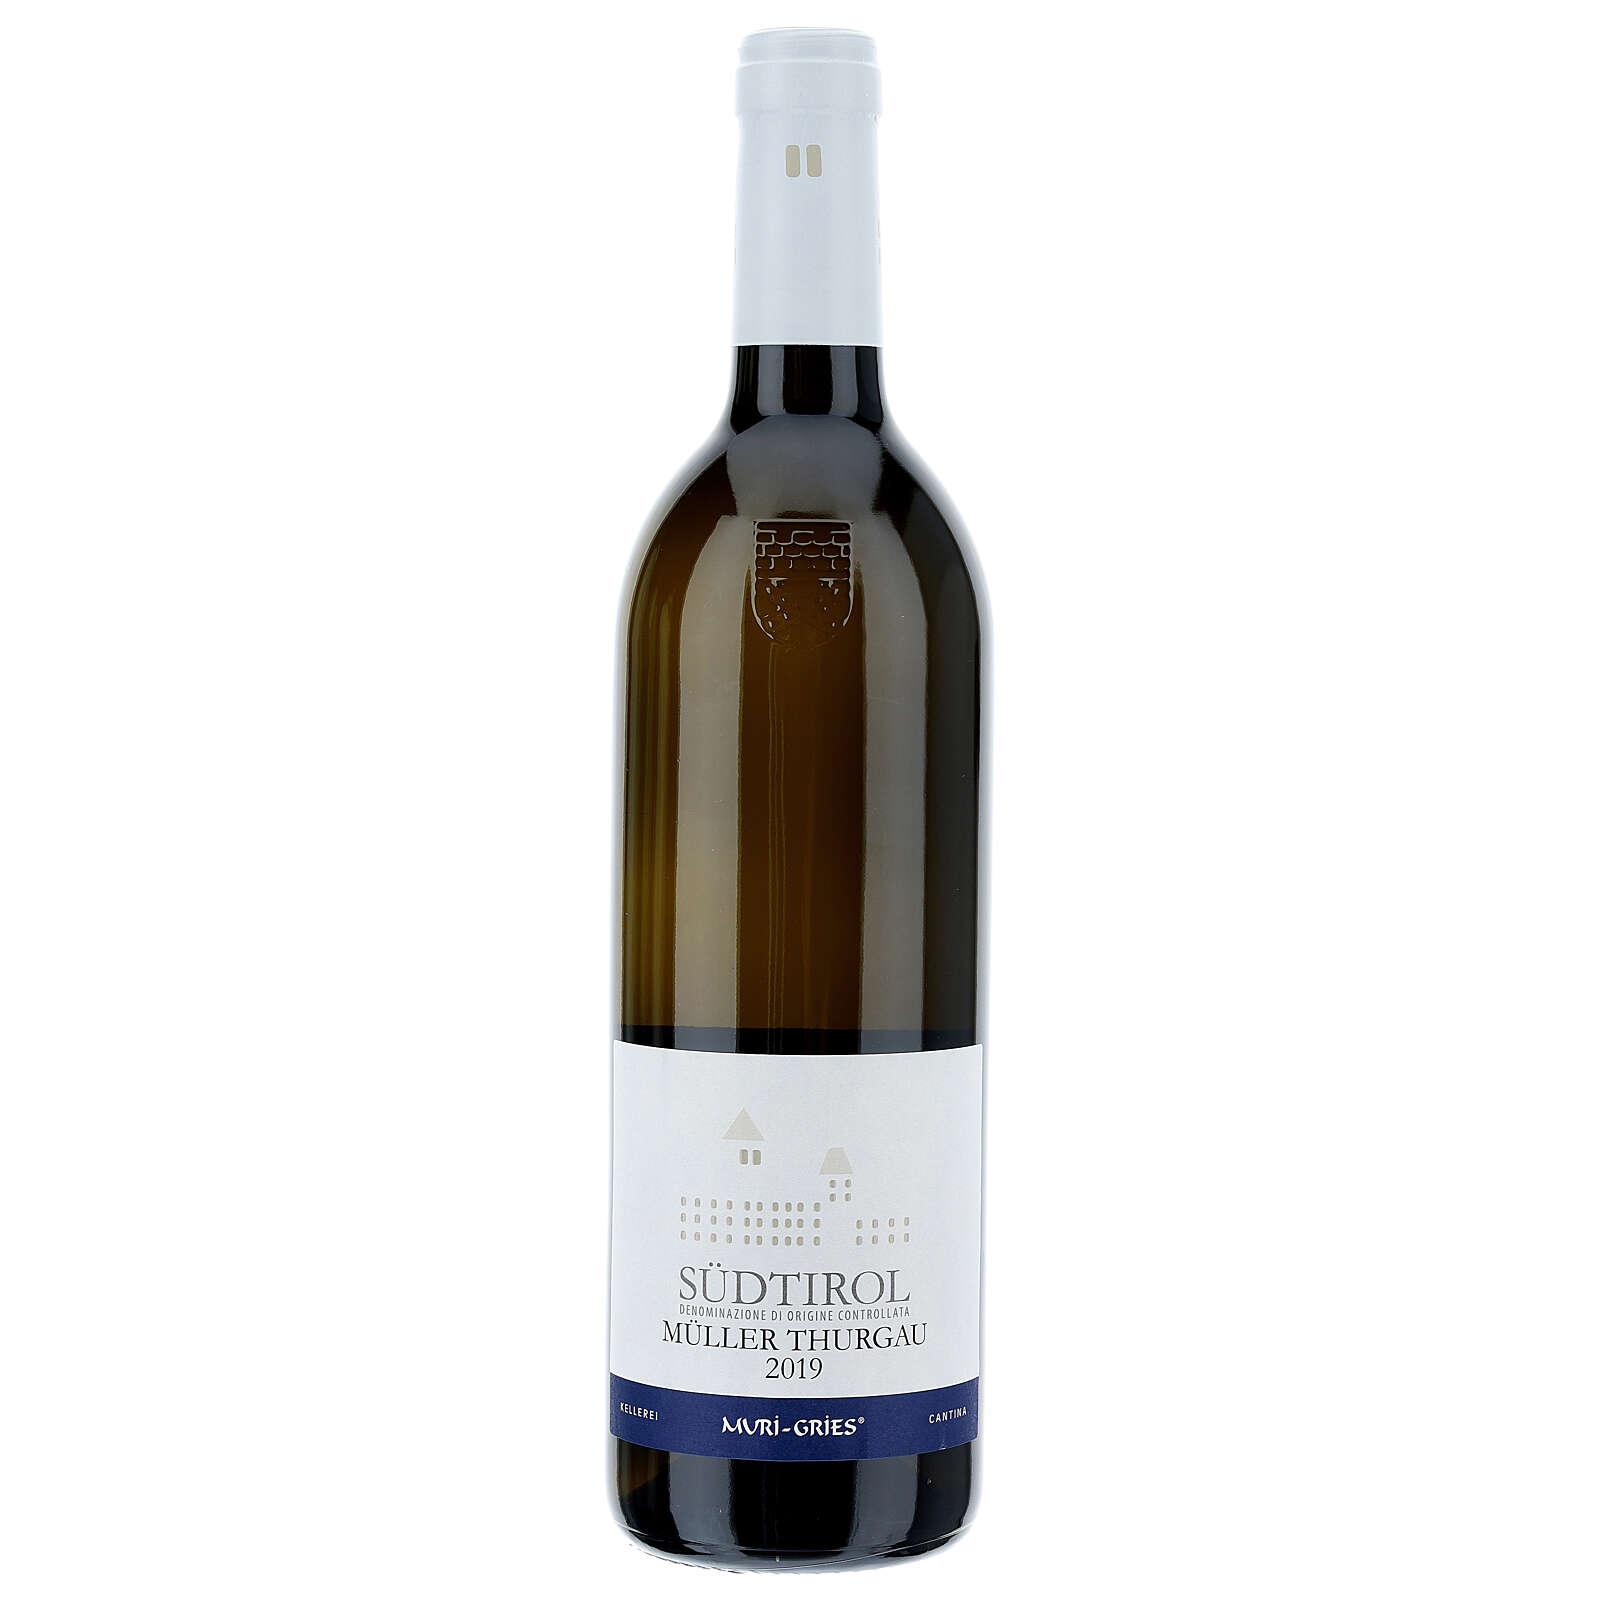 Vino Muller Thurgau DOC 2019 Abadía Muri Gries 750 ml 3